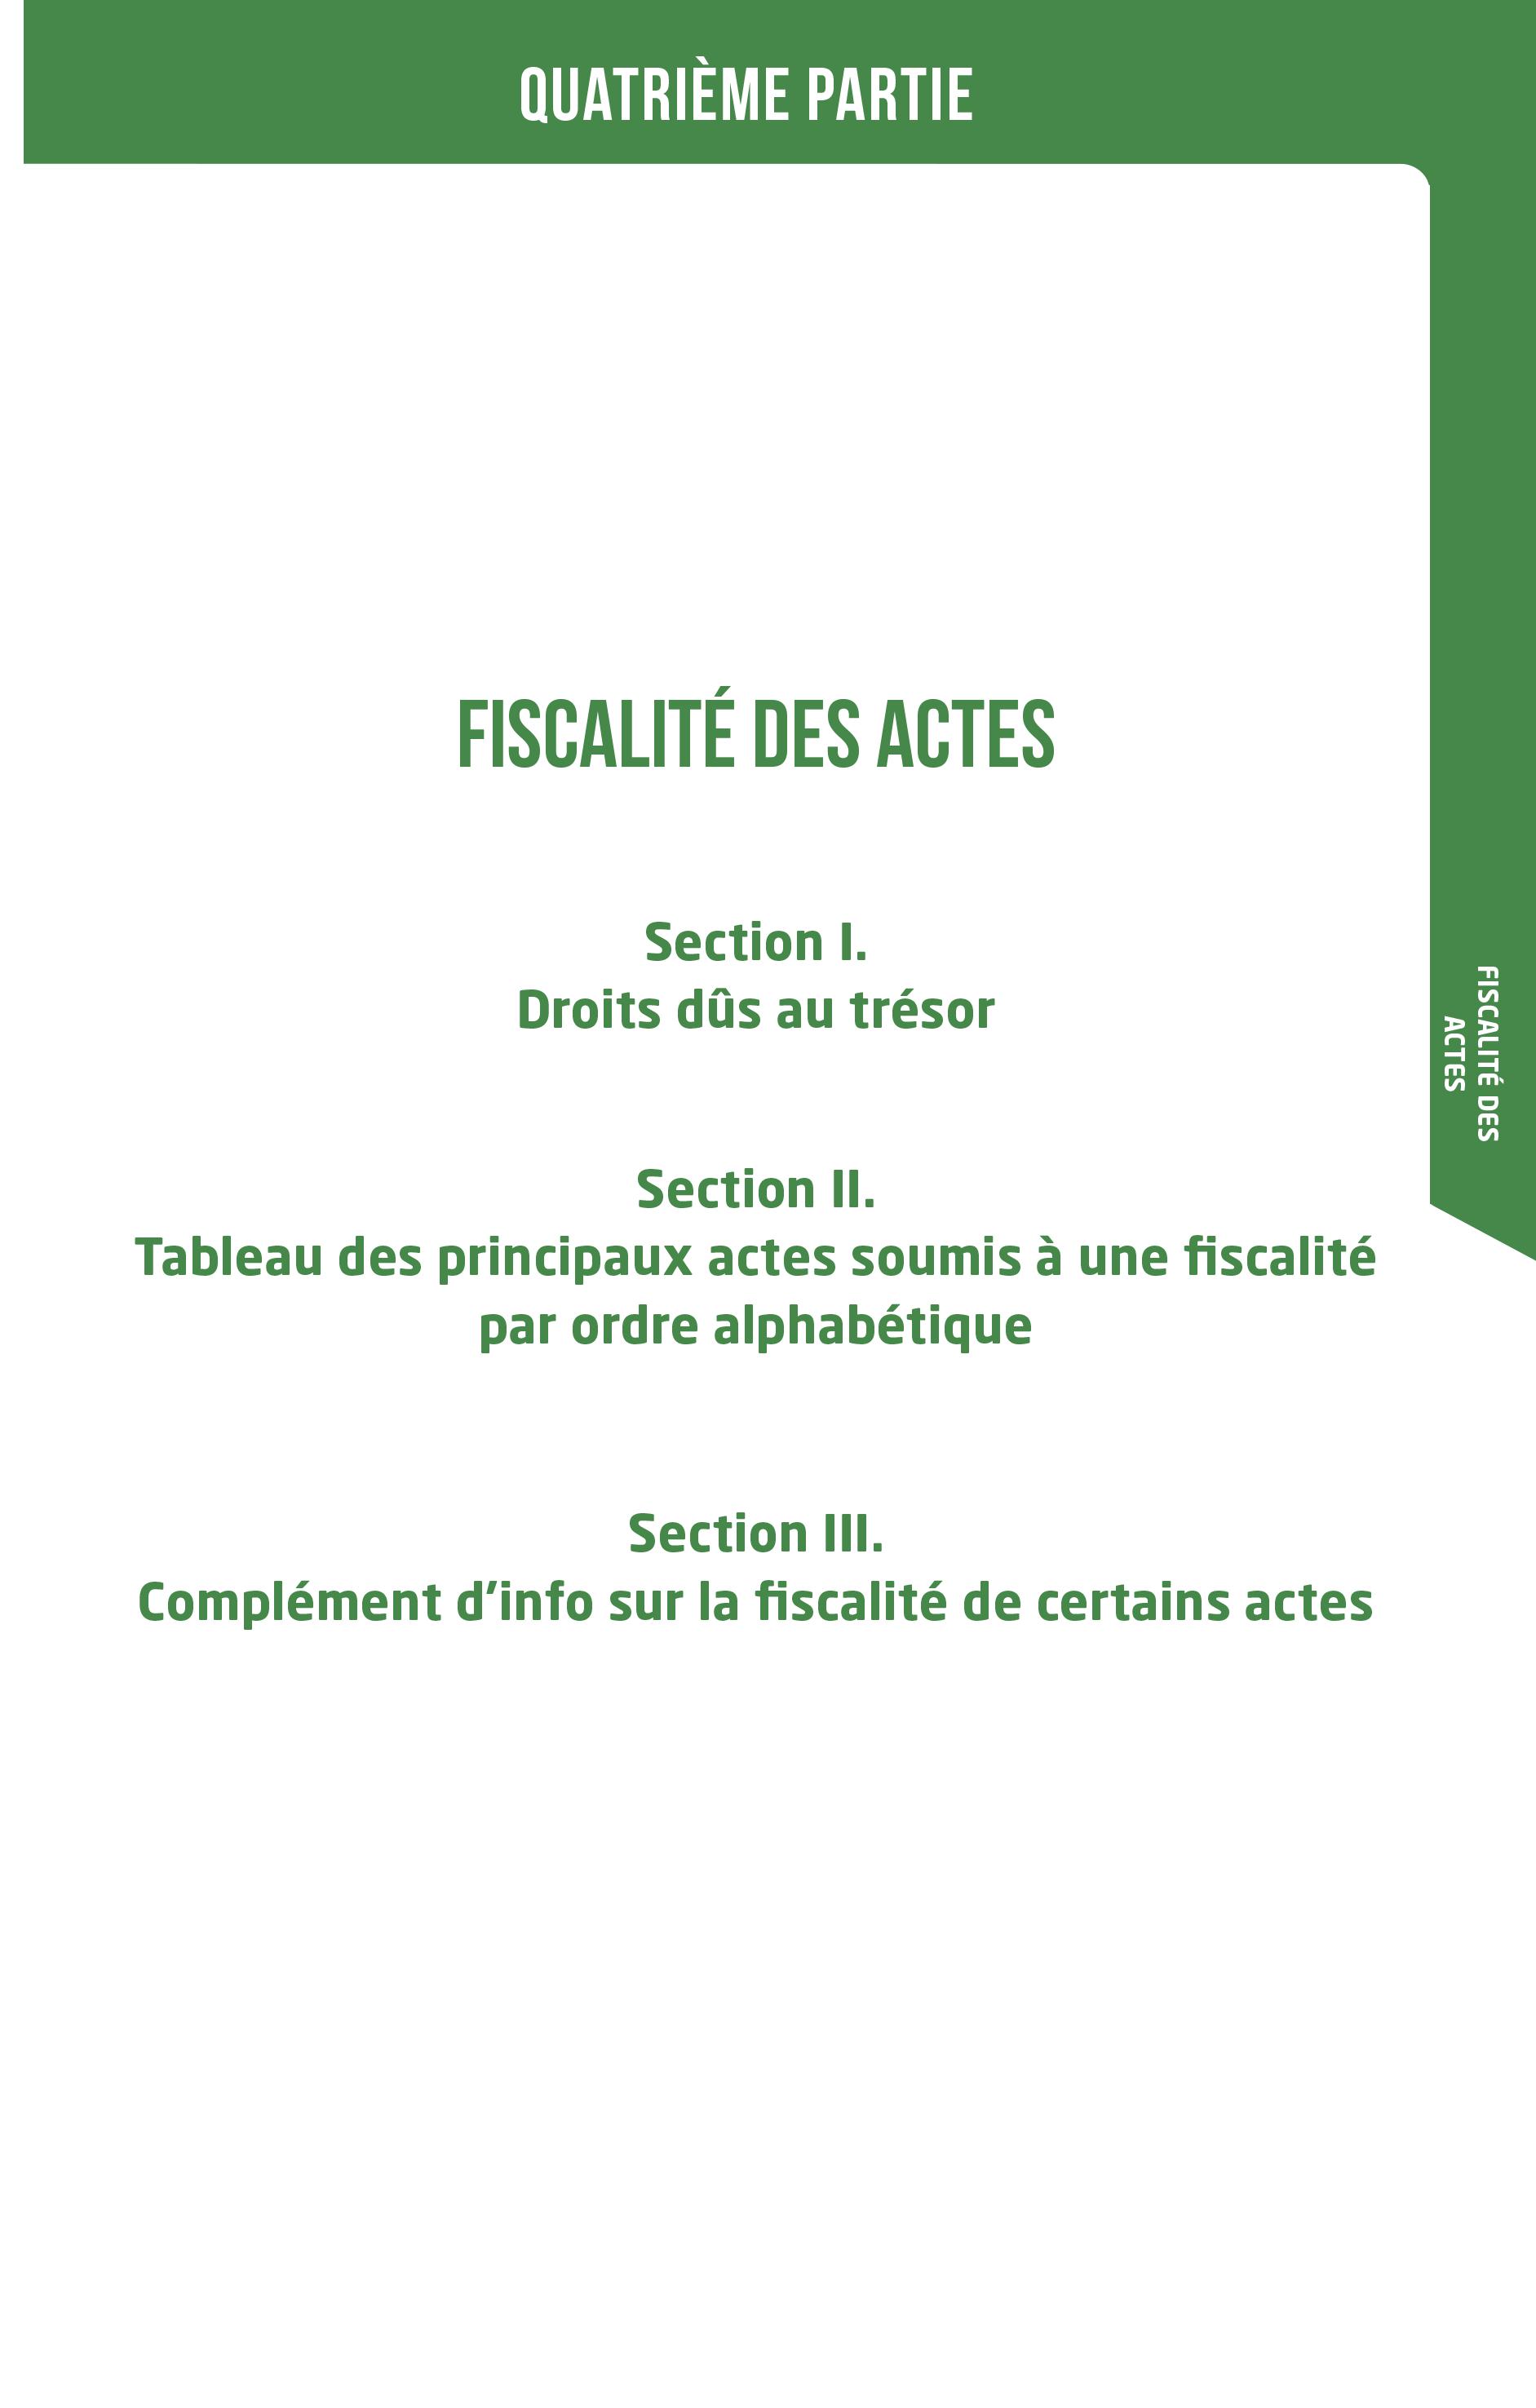 Essentiel - Fiscalité